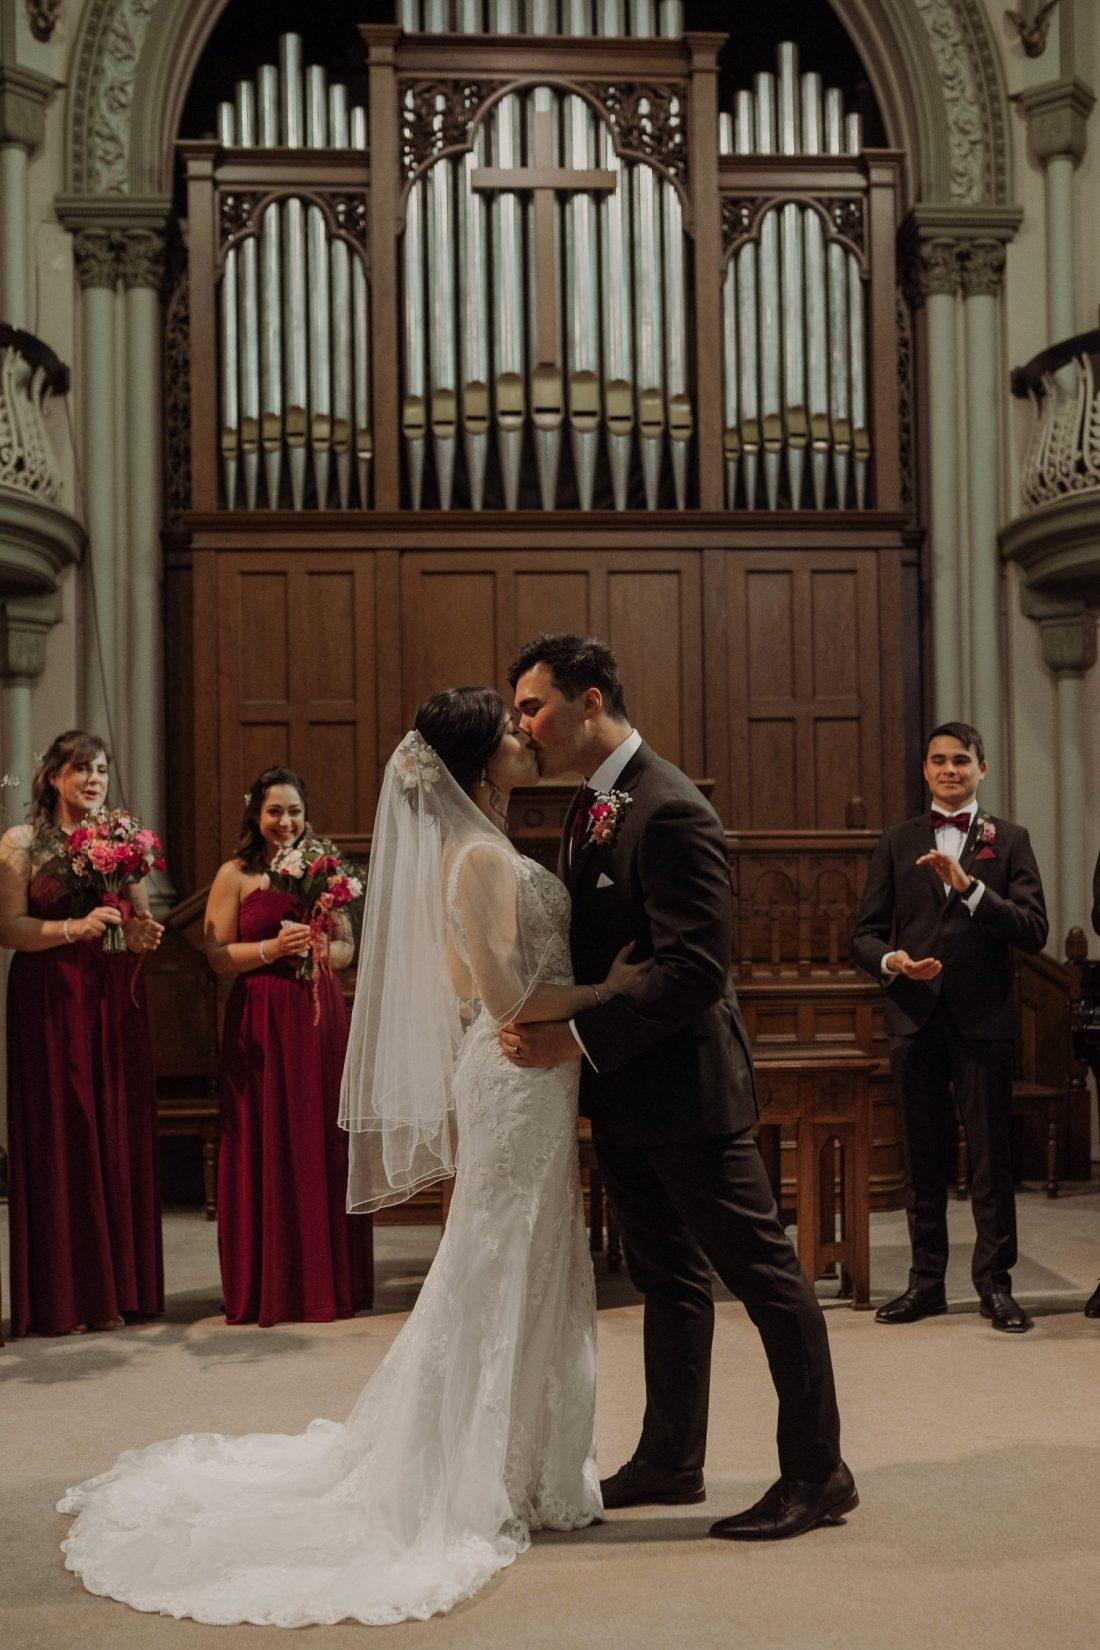 Ebony Blush Photography | Perth Wedding Photographer | Photography + Film | Sandalford Winery | Como Treasury Wedding | Perth City Wedding |Alex + Mel49